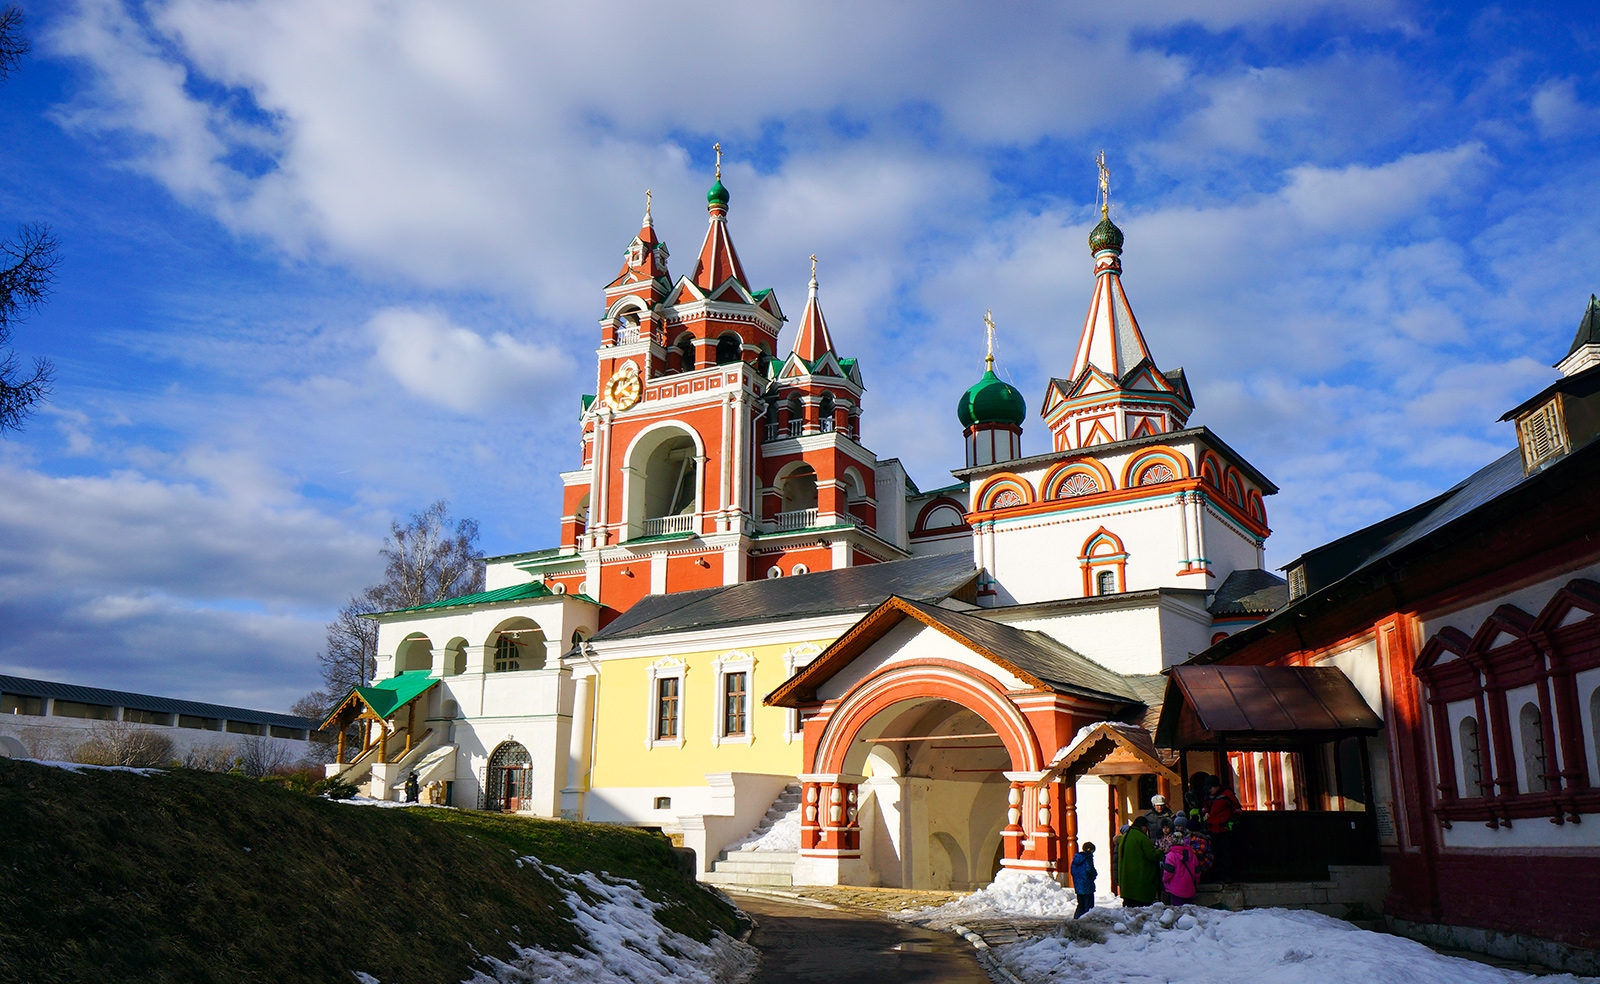 savvino storozhevsky monastyr v zvenigorode zvg01 e1620737330374 - 3 города, которые стоит посетить в Московской области.